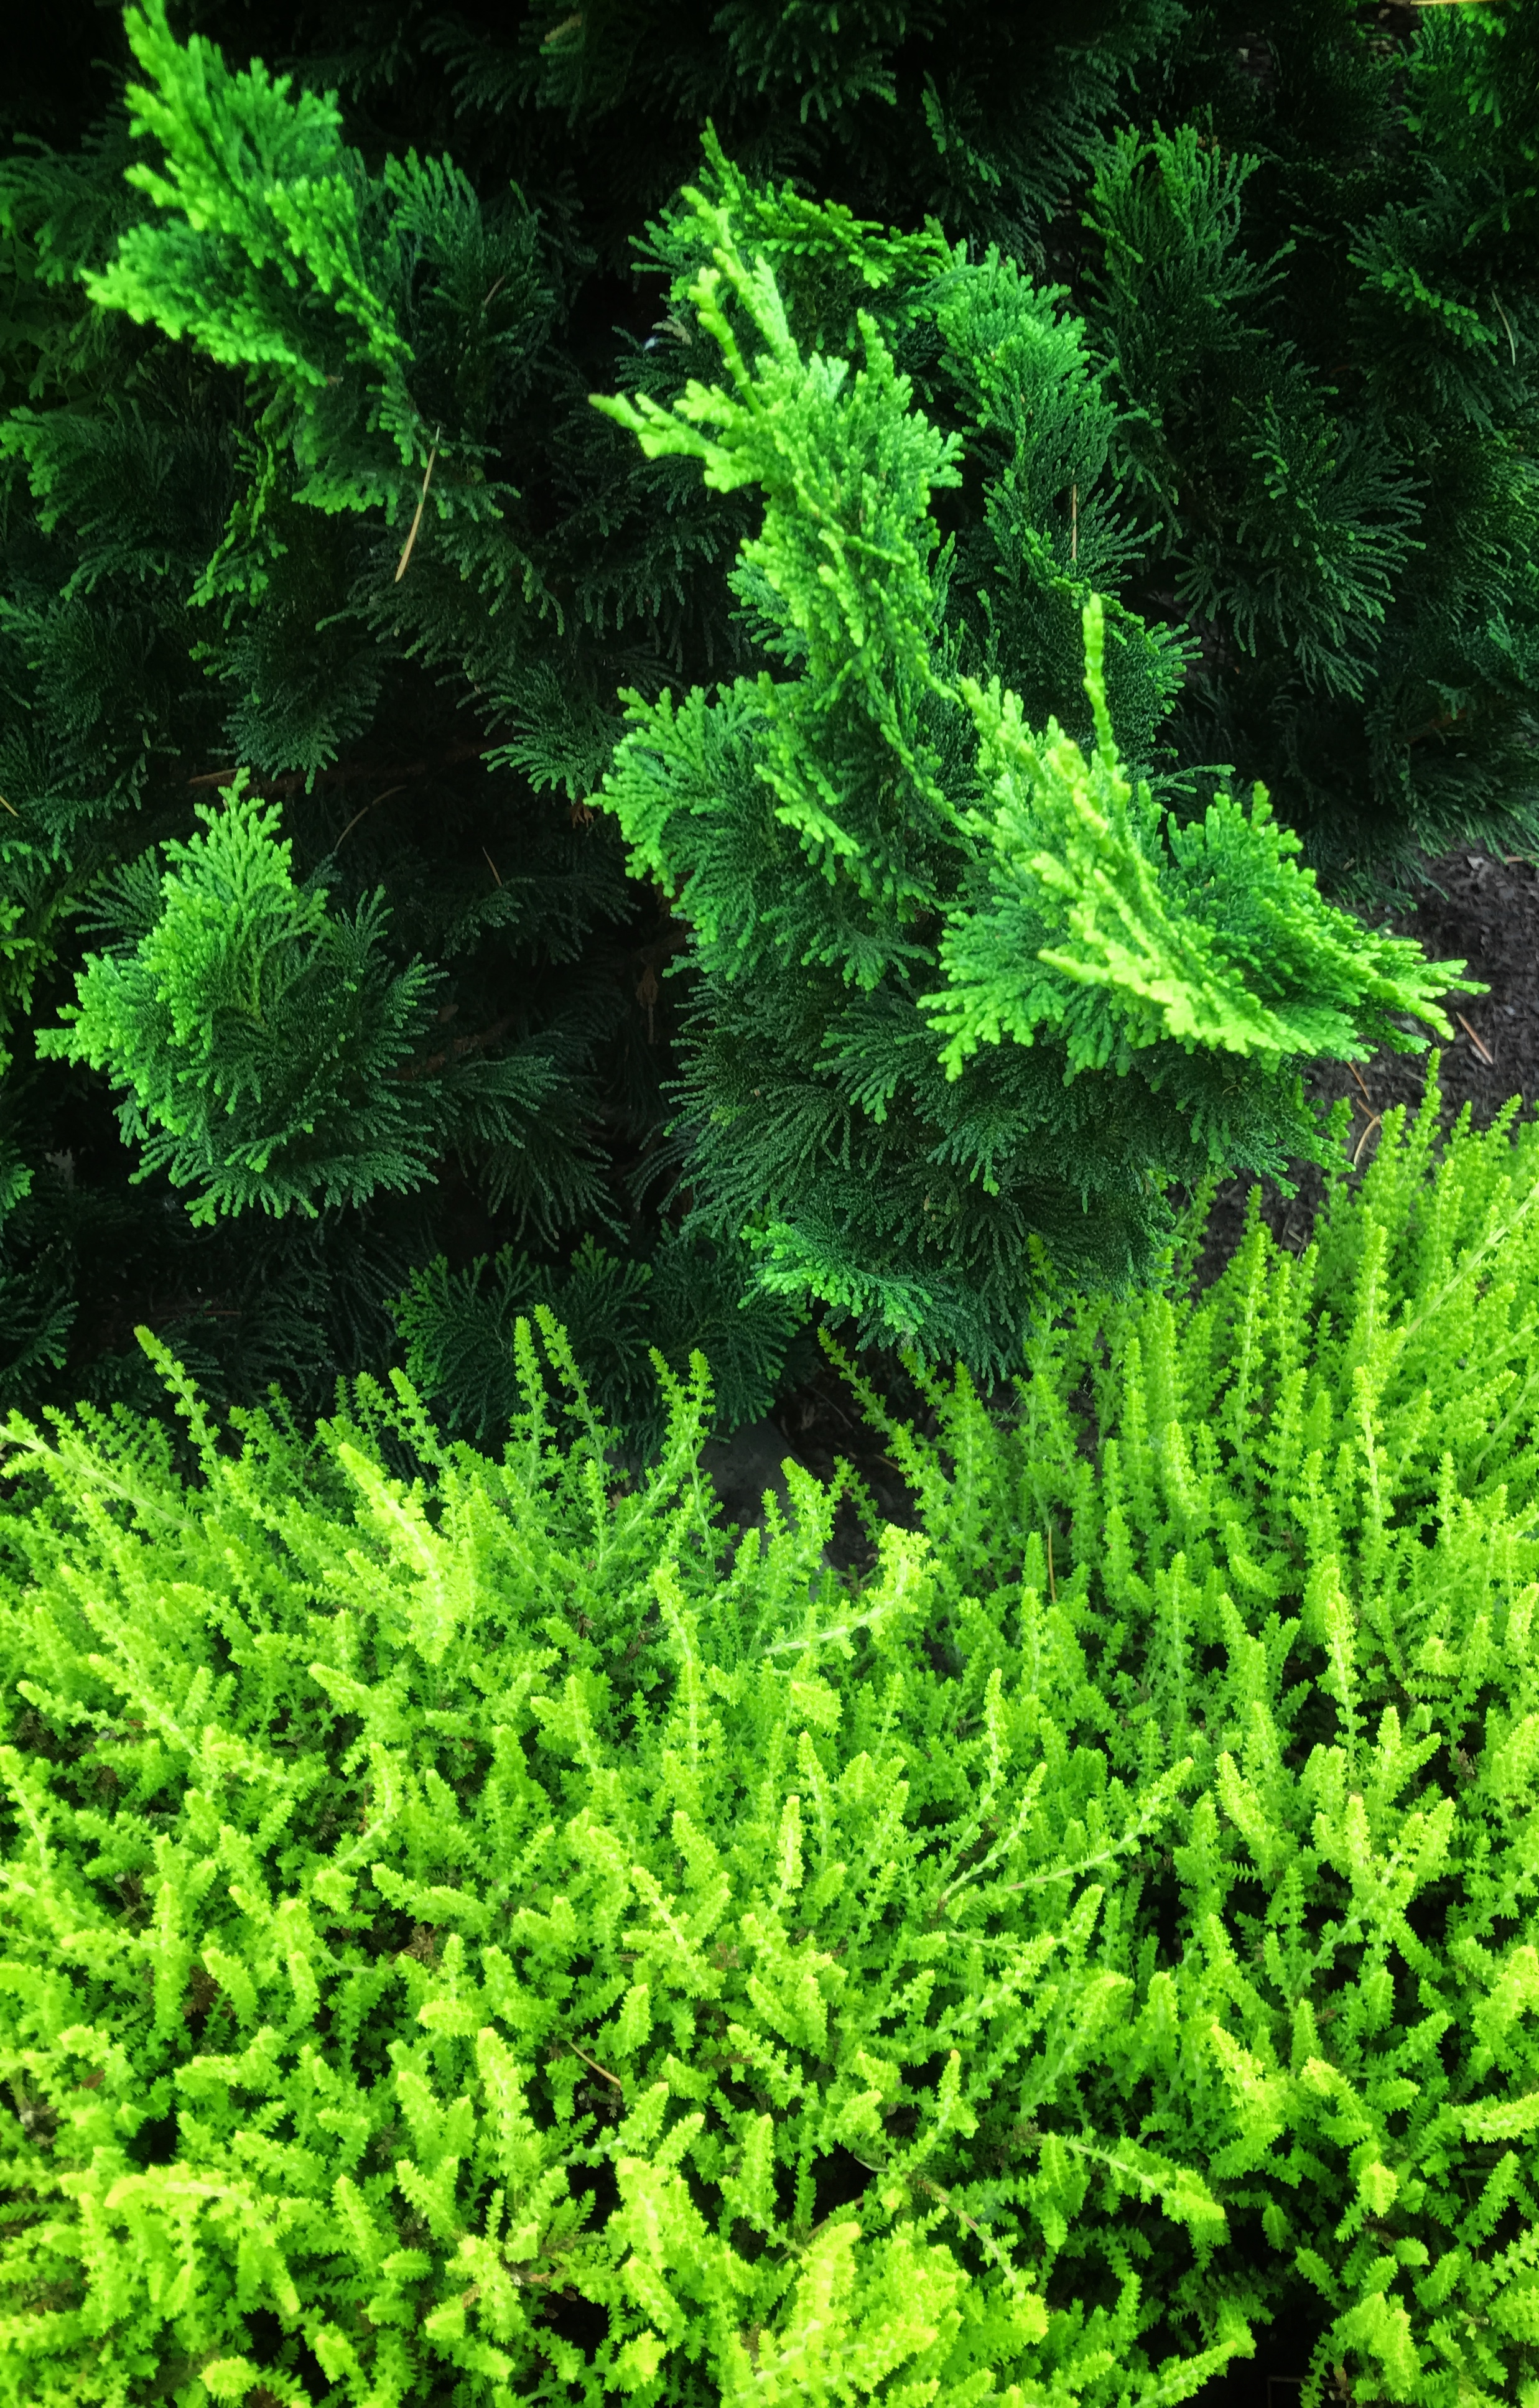 Foliage combo: Chamaecyparis obtusa (Hinoki cypress) cultivar and Calluna (Heather).